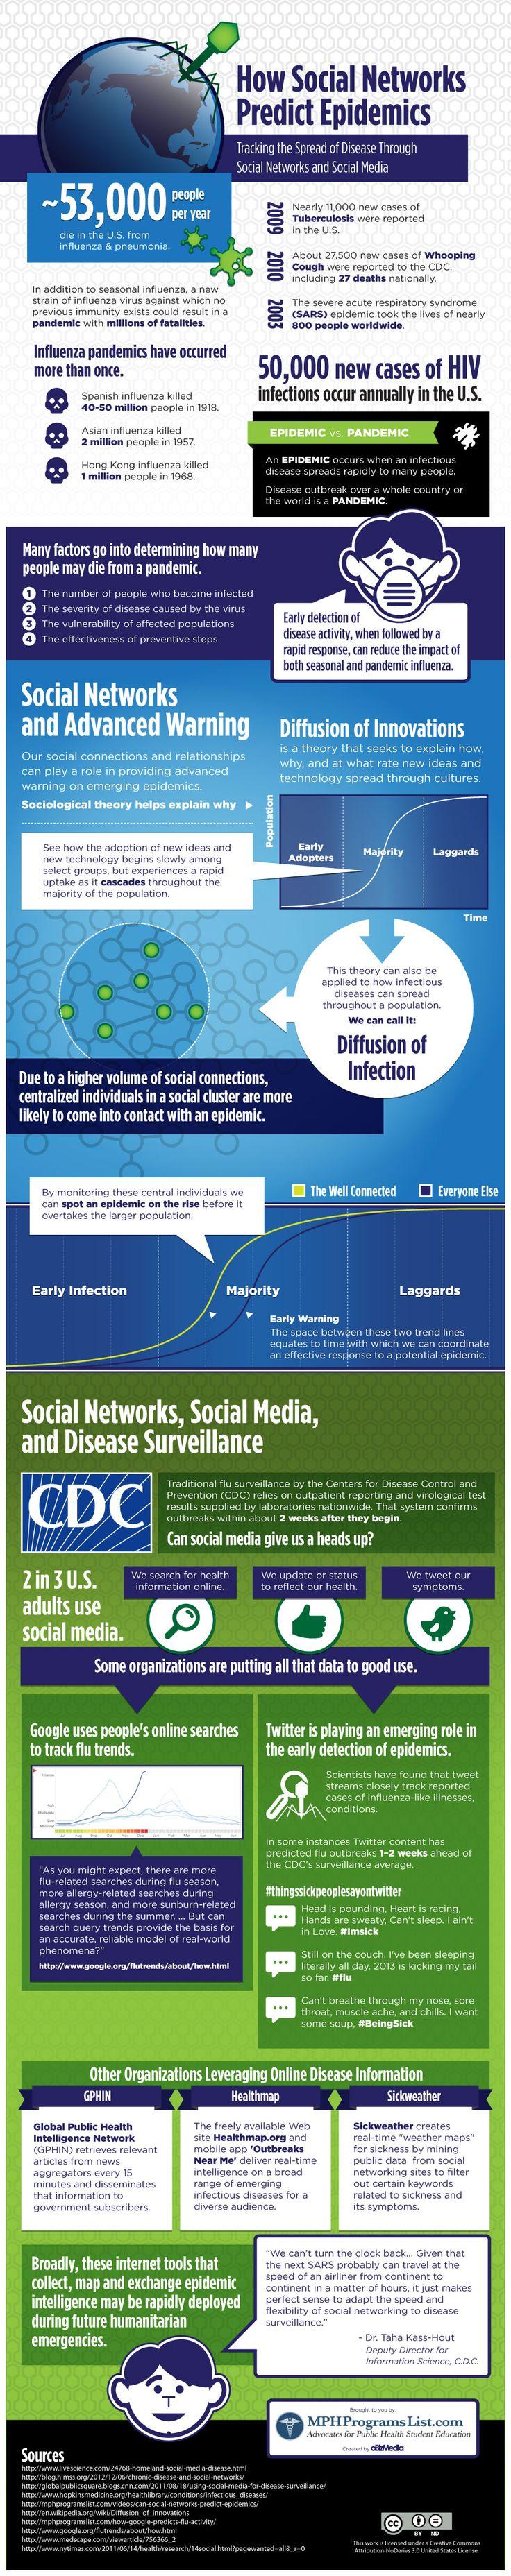 How Social Networks predic epidemic #hcsm